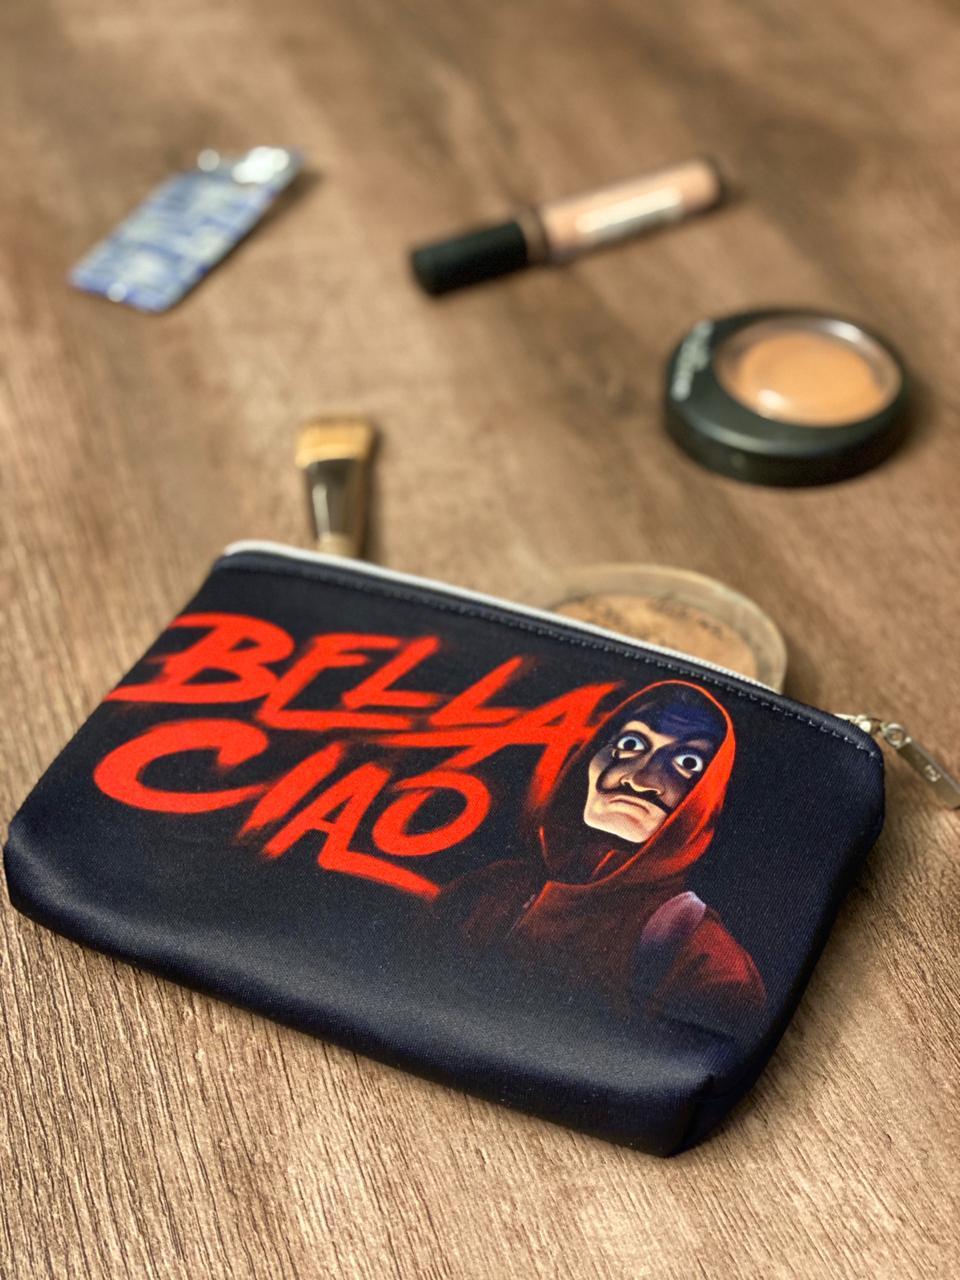 Necessaire Bella Ciao: La Casa De Papel